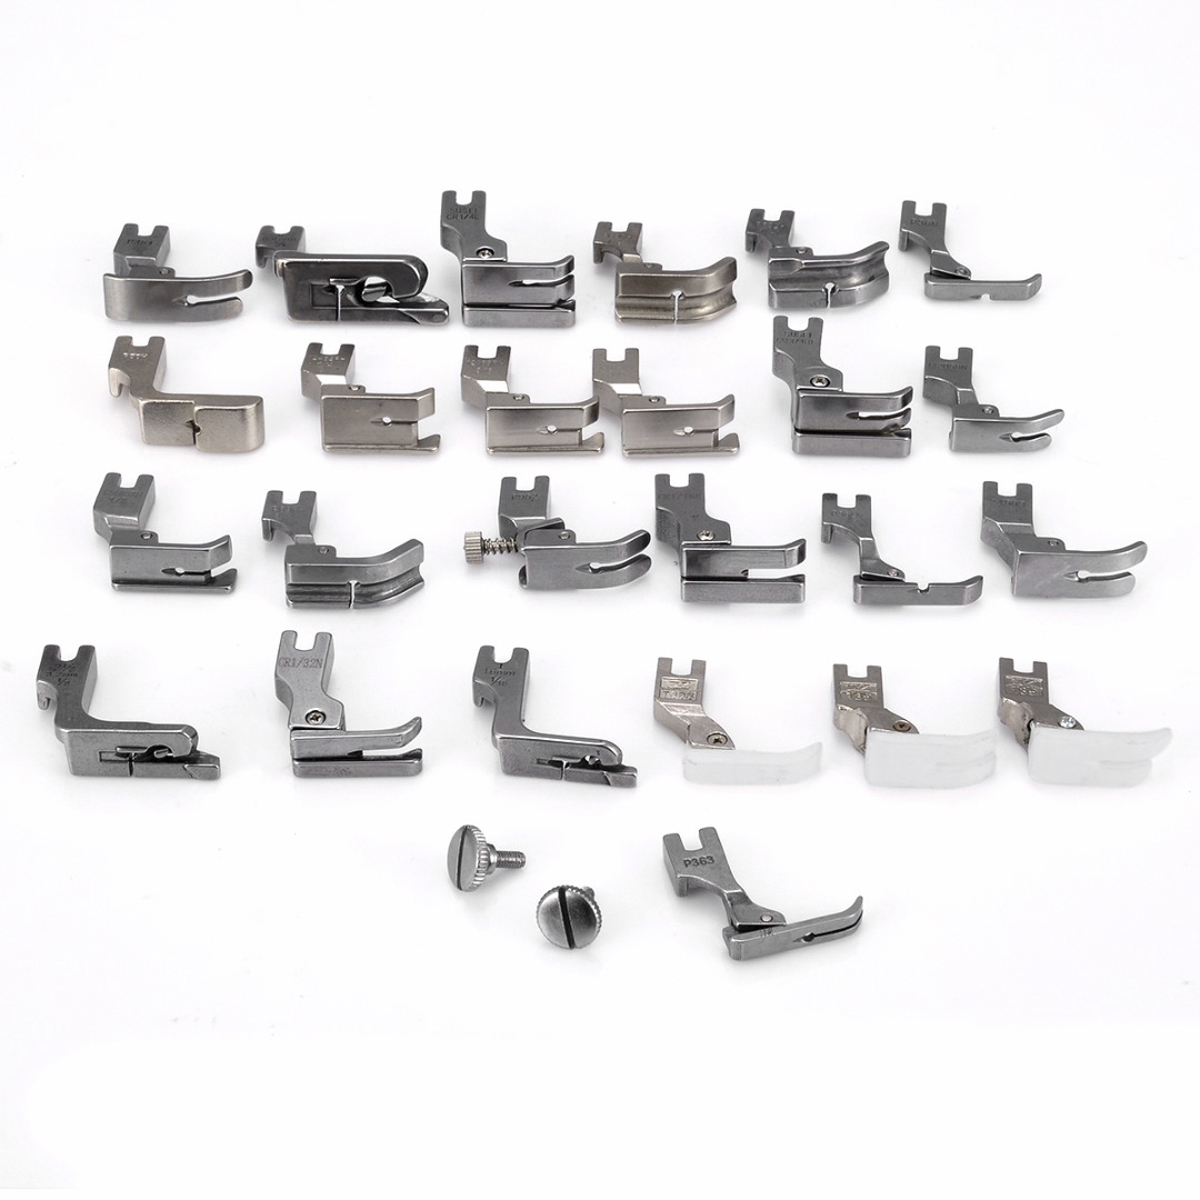 25Pcs Sewing Machine Presser Foot Set Sewing Accessories For JUKI DDL-5550 8500 8700 Industrial Sewing Machine Presser Foot New